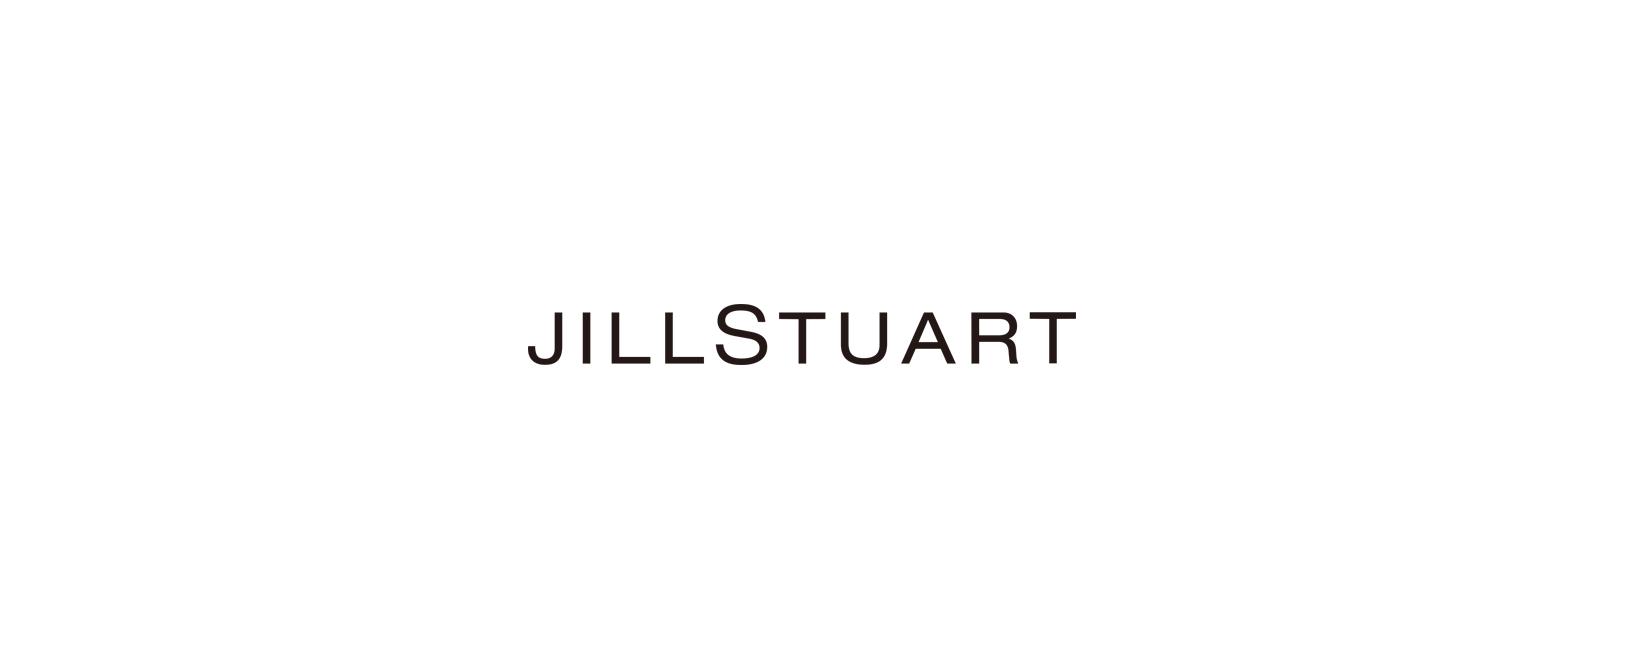 JILL STUART Discount Code 2021